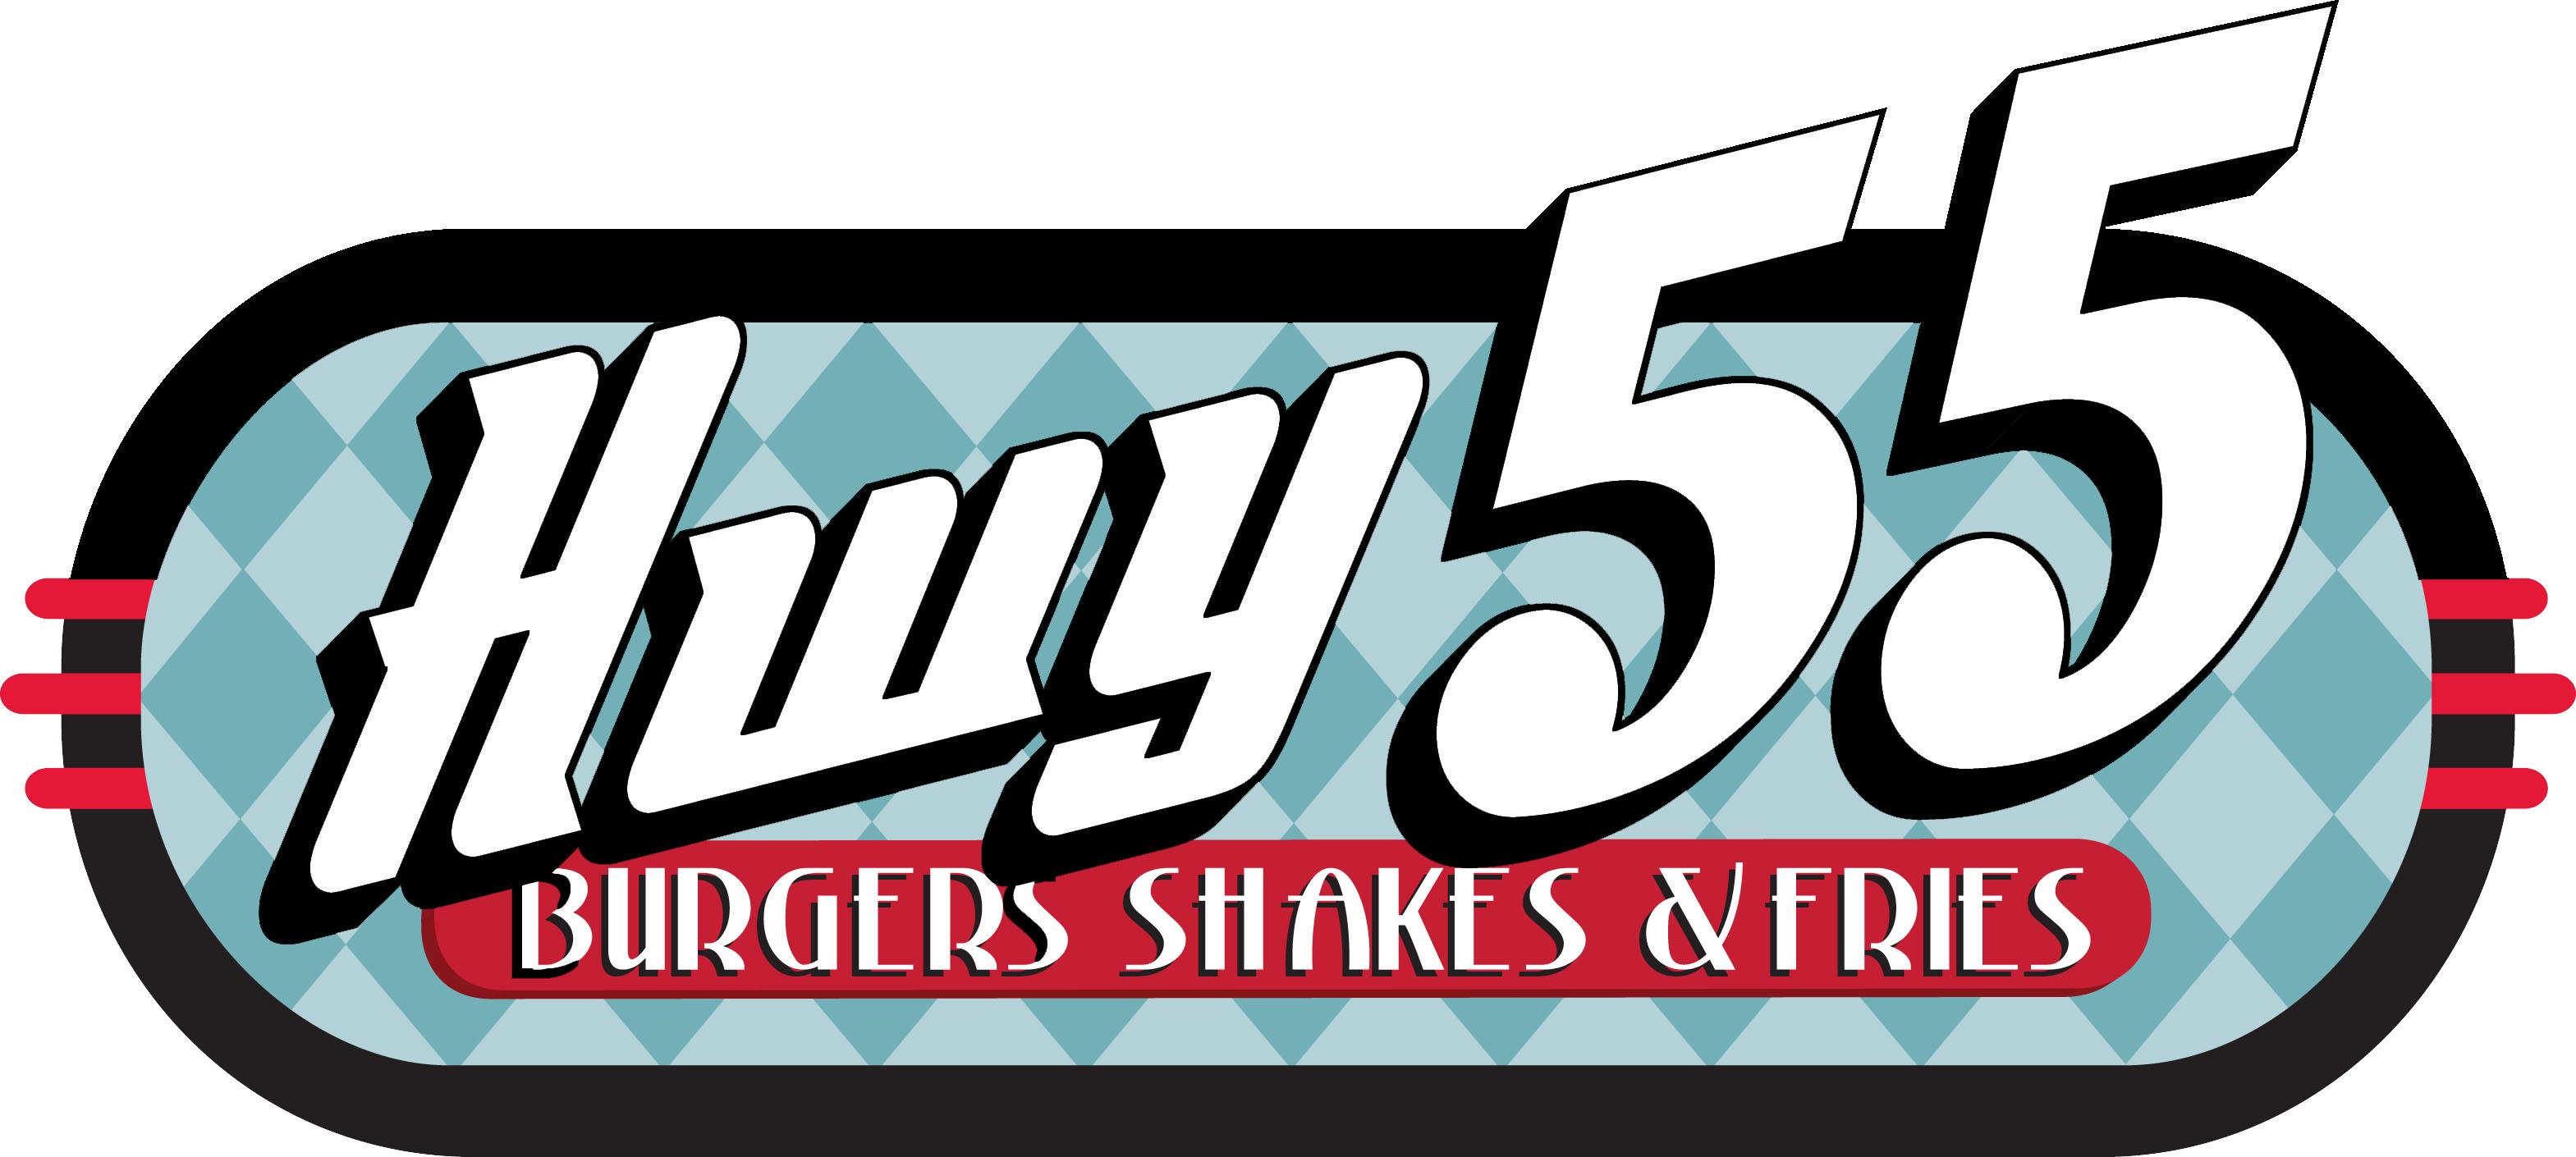 Hwy 55 Near Me >> How Do I Find A Hwy 55 Store Near Me Hwy 55